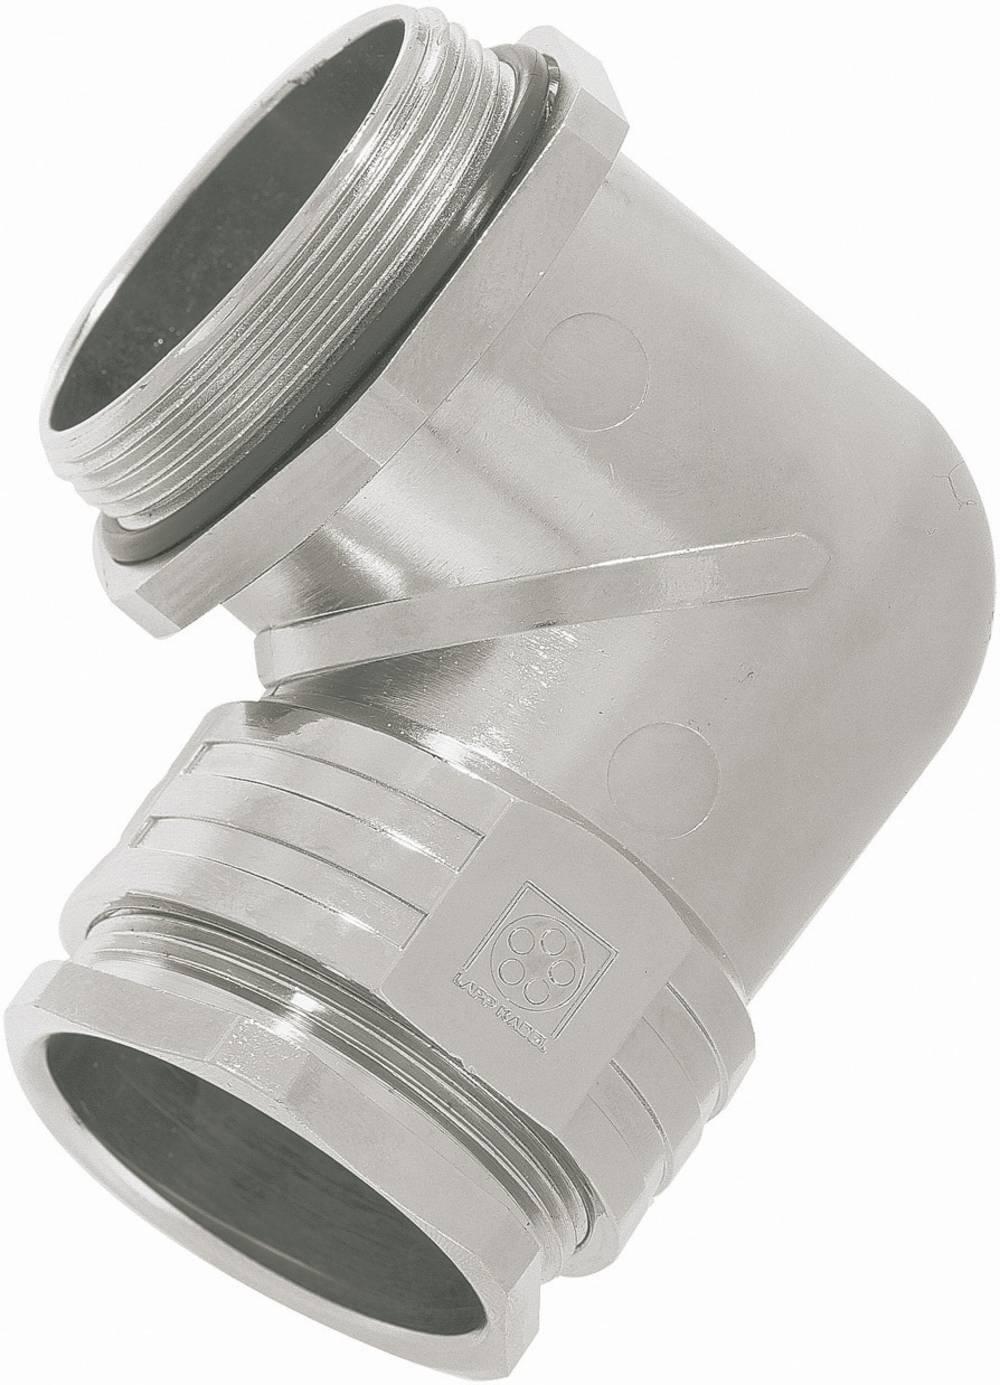 Vinkelforskruning LappKabel SKINDICHT® RWV-M12 x 1.5 M12 Messing Messing 1 stk